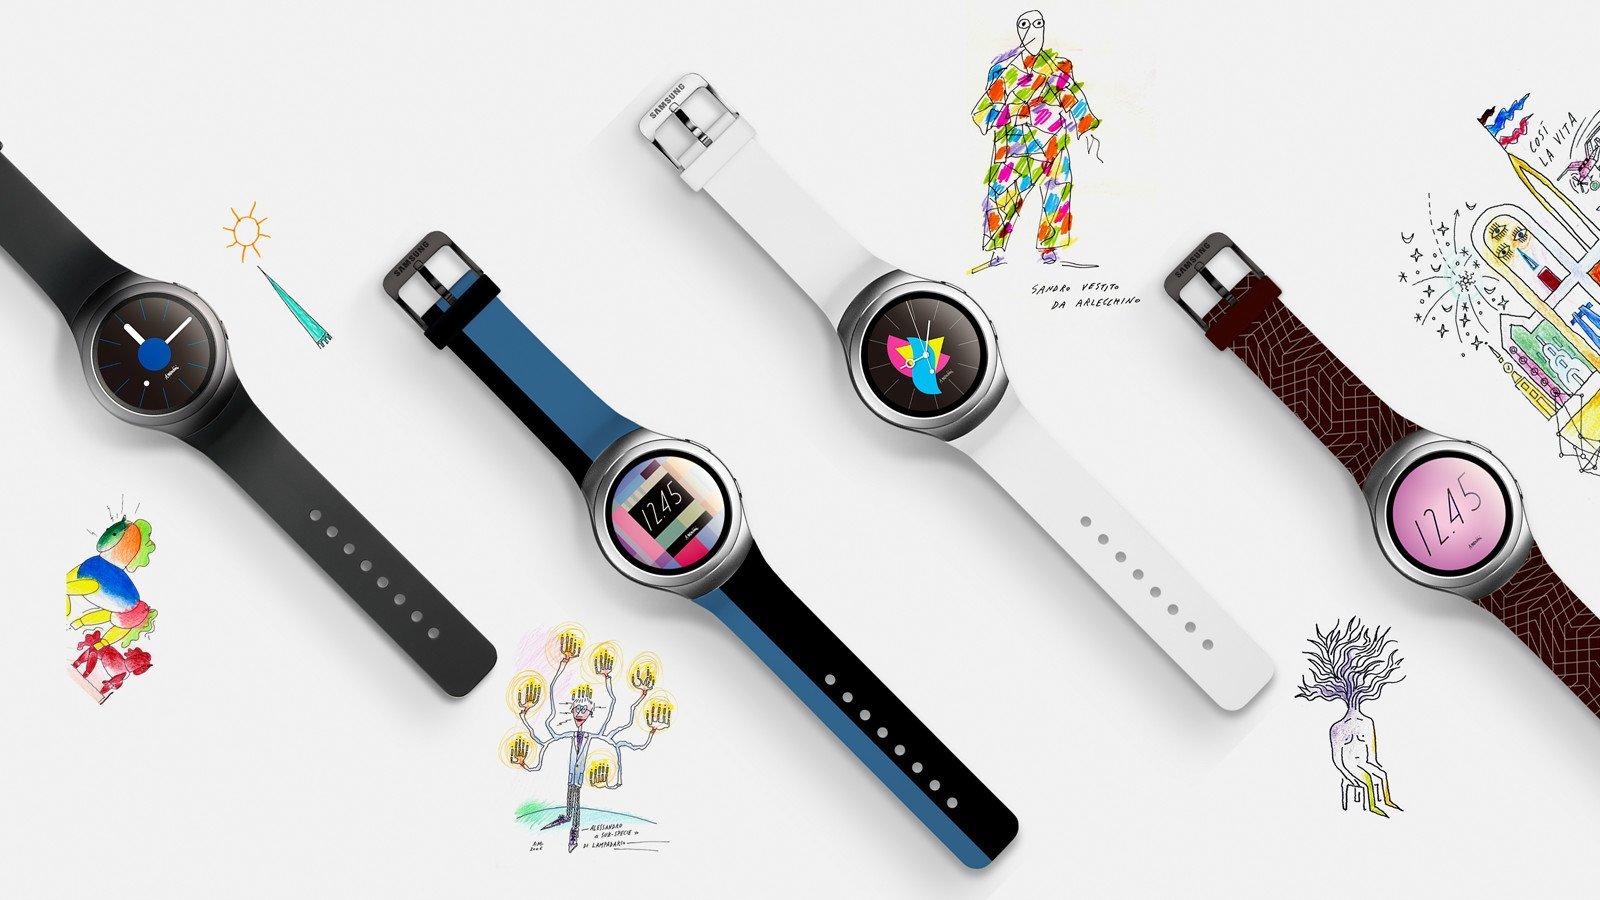 Samsung Galaxy Gear S2 – A unique smart-watch experience